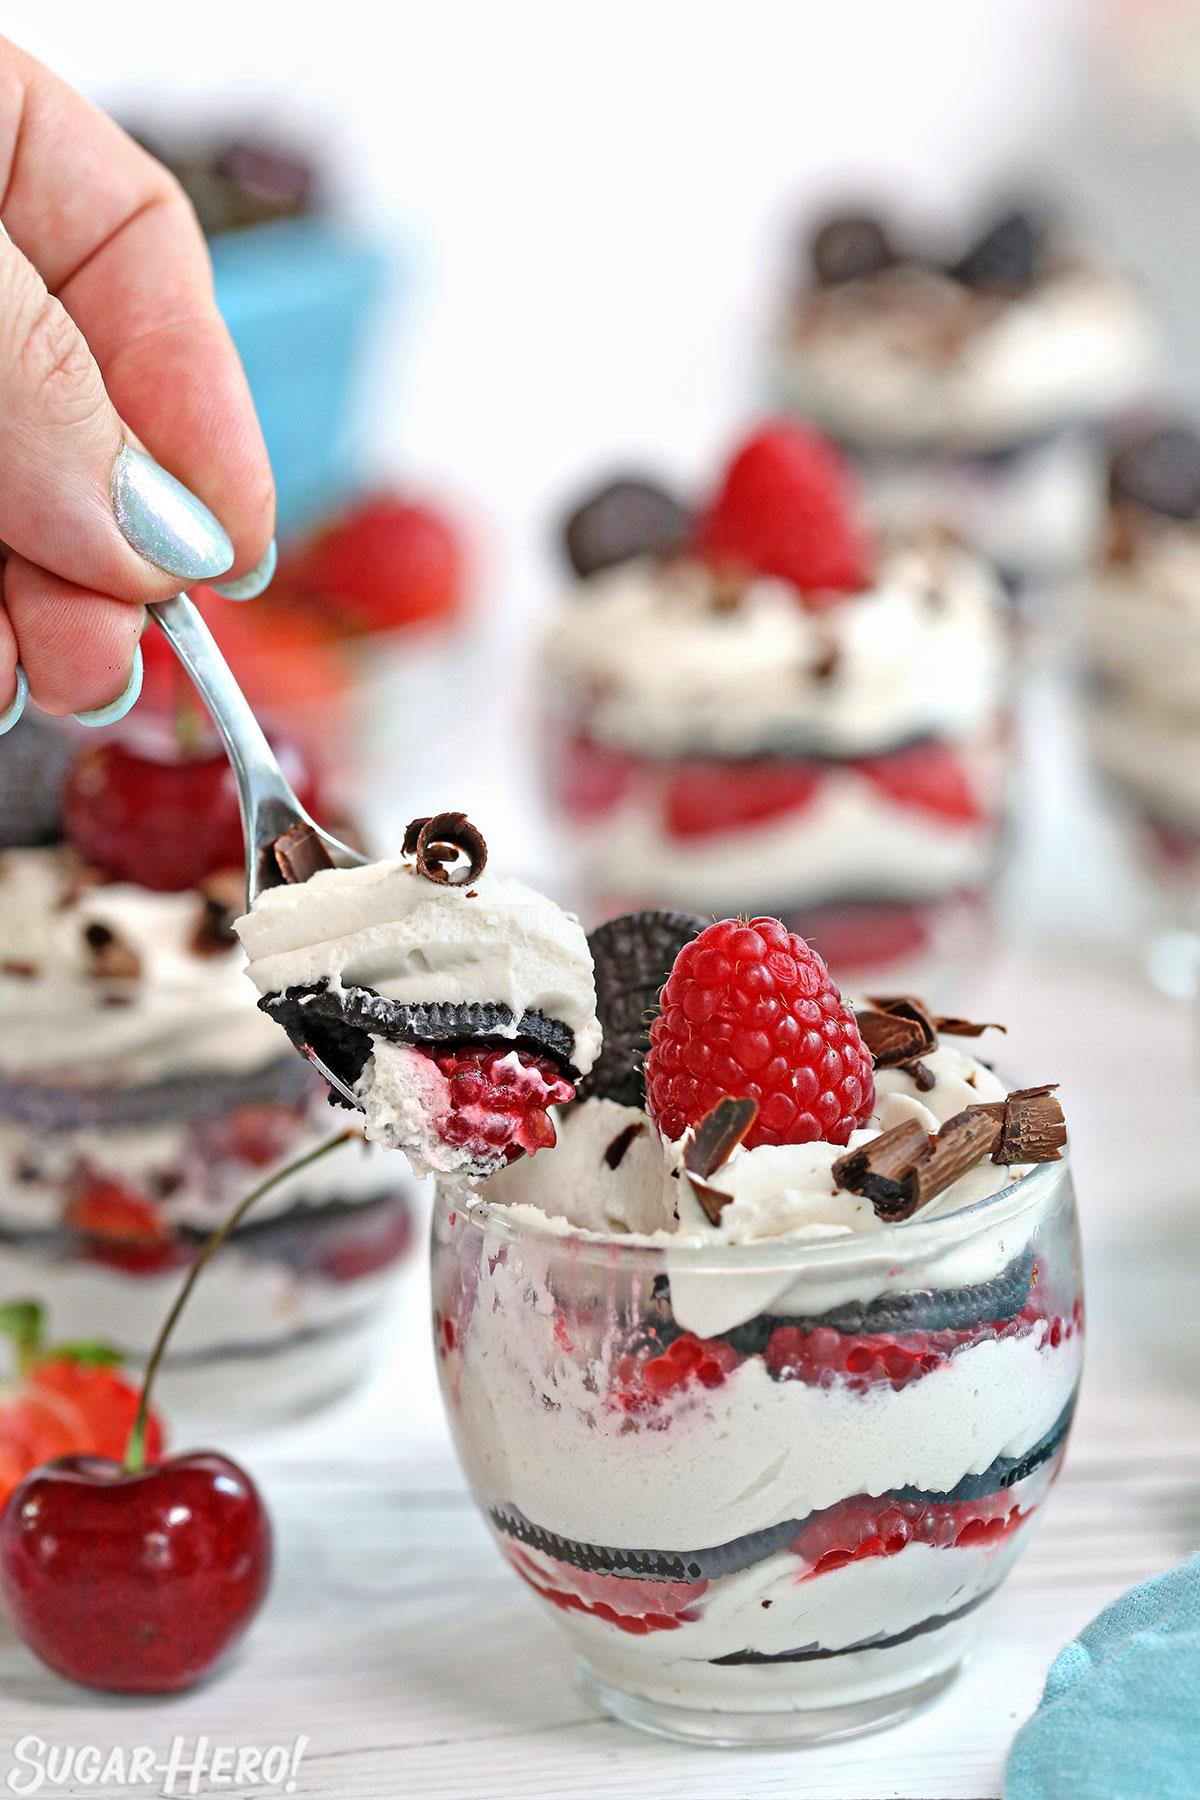 Mini Oreo Icebox Cakes - taking a spoonful of no-bake Oreo cake | From SugarHero.com